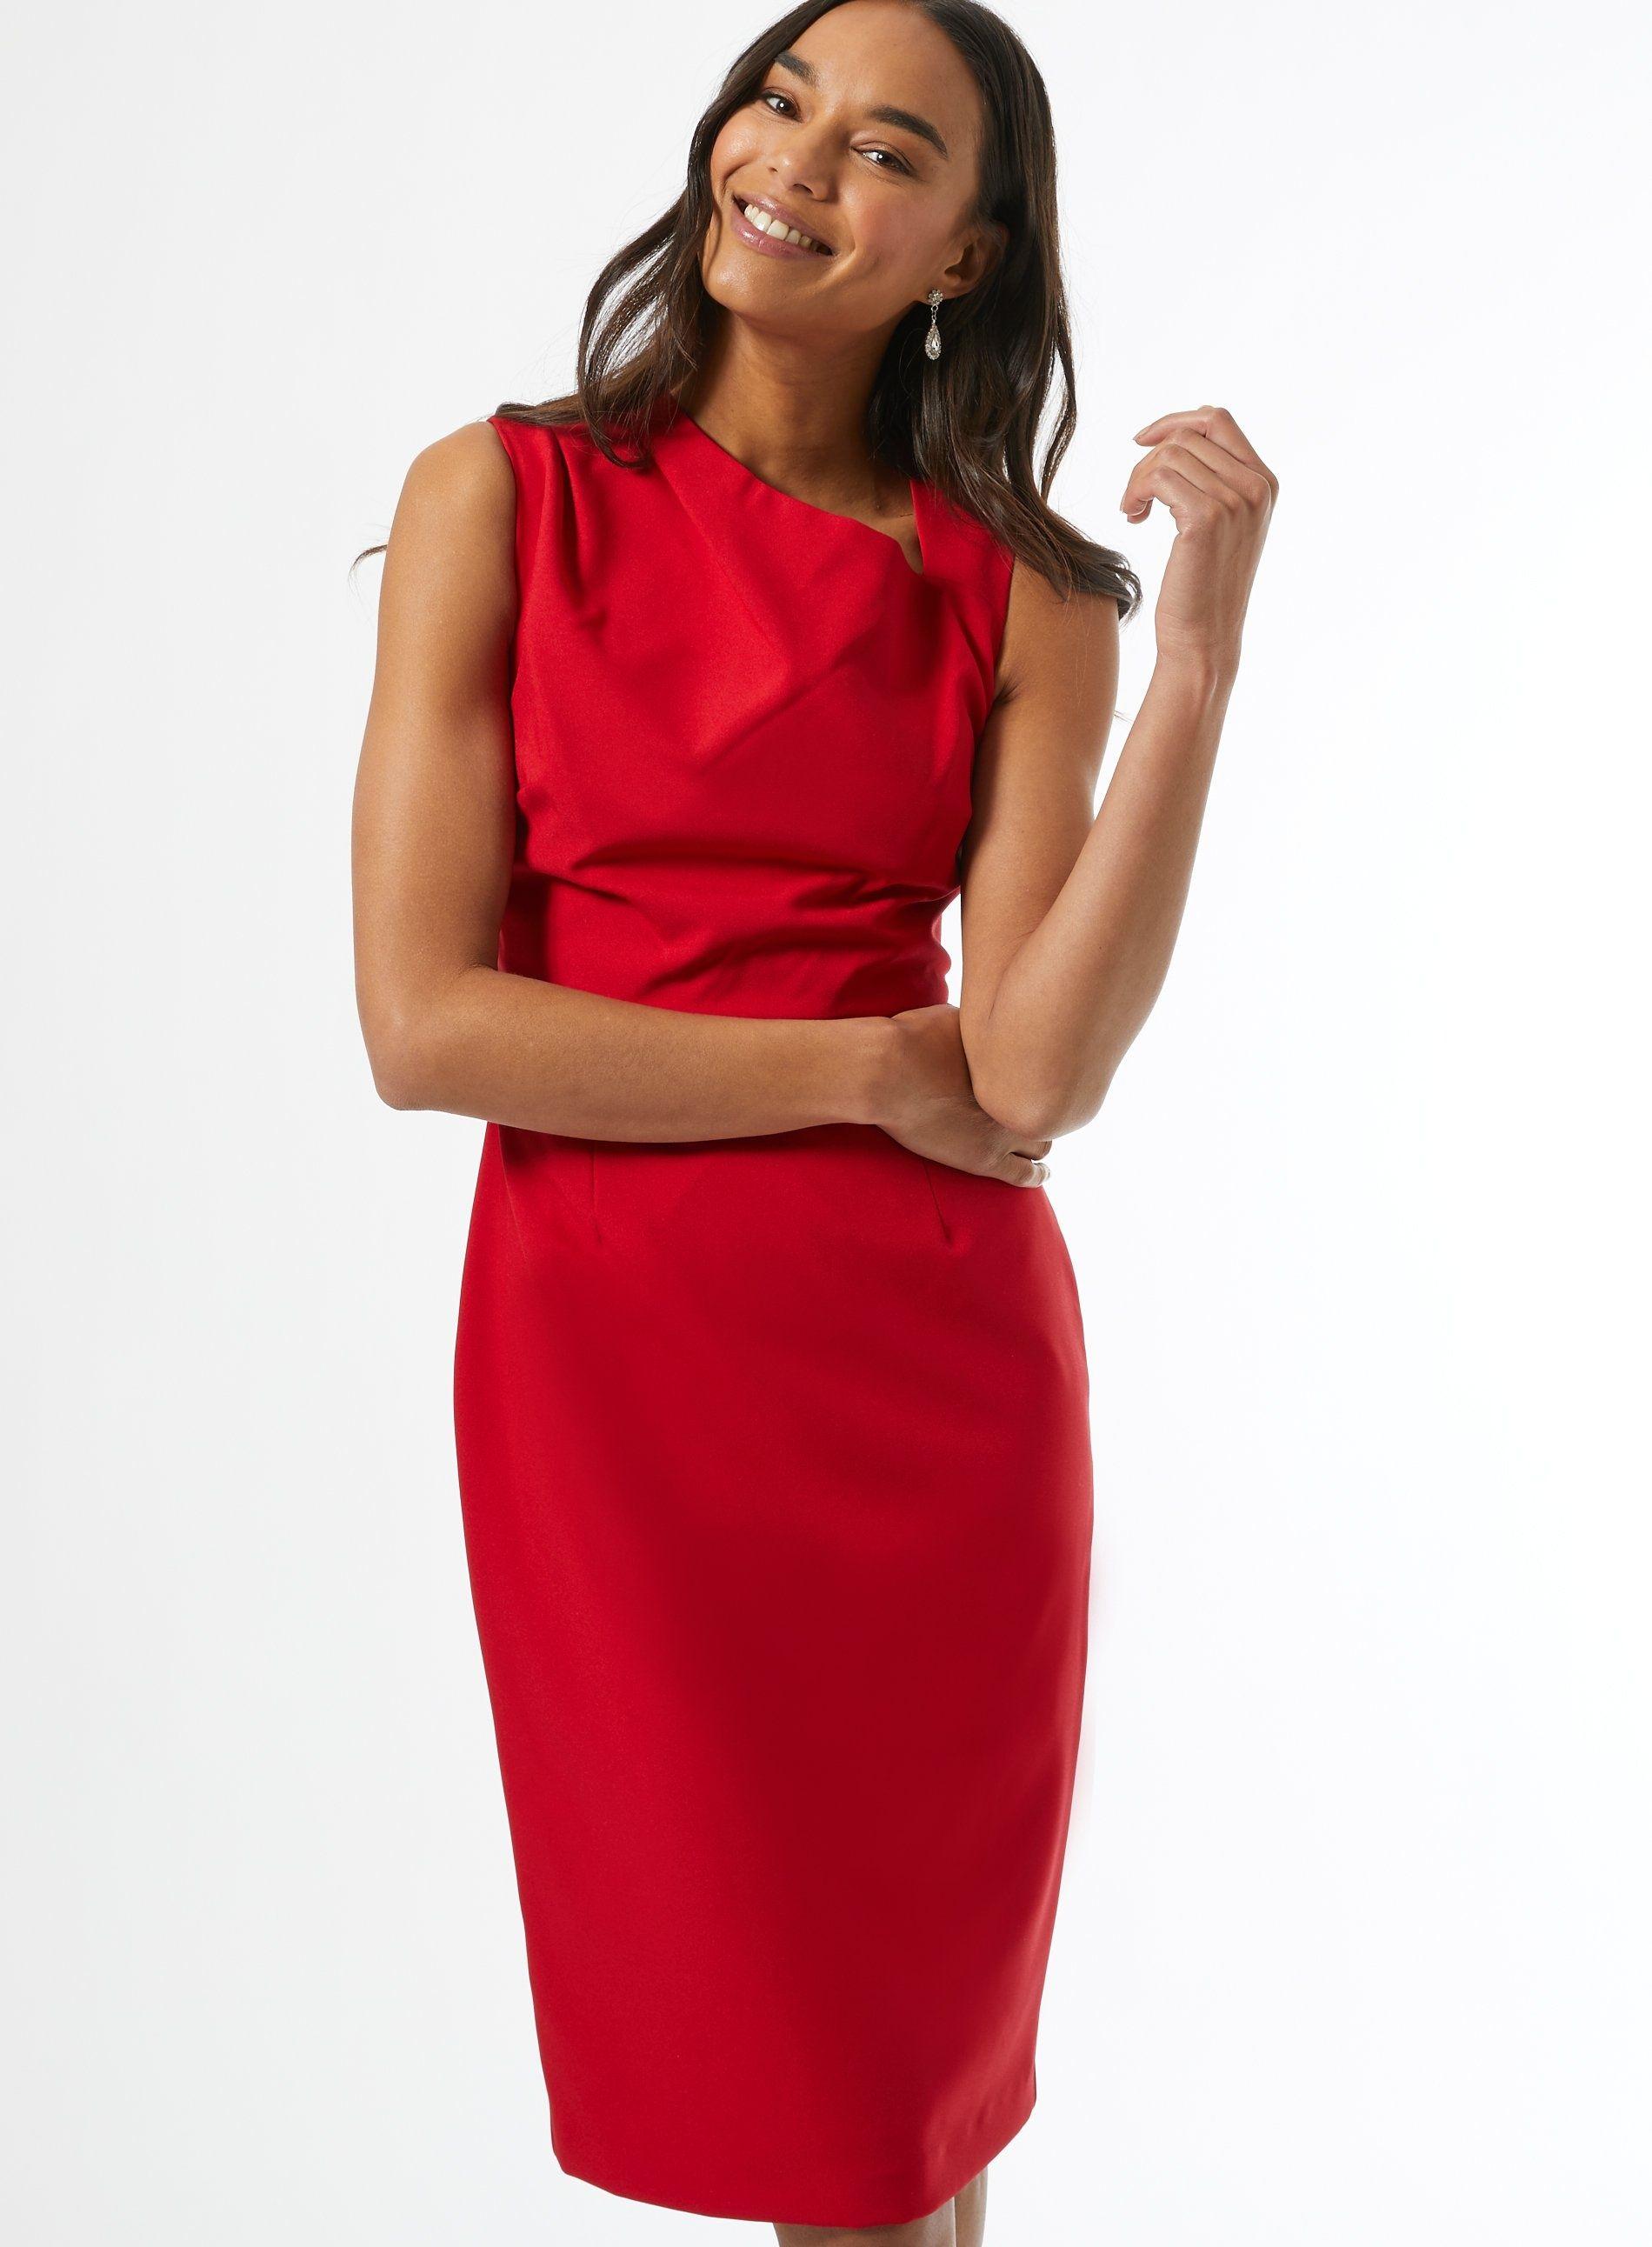 Dorothy Perkins Womens Red Asymmetric Neck Plain Elegant Sleeveless Dress